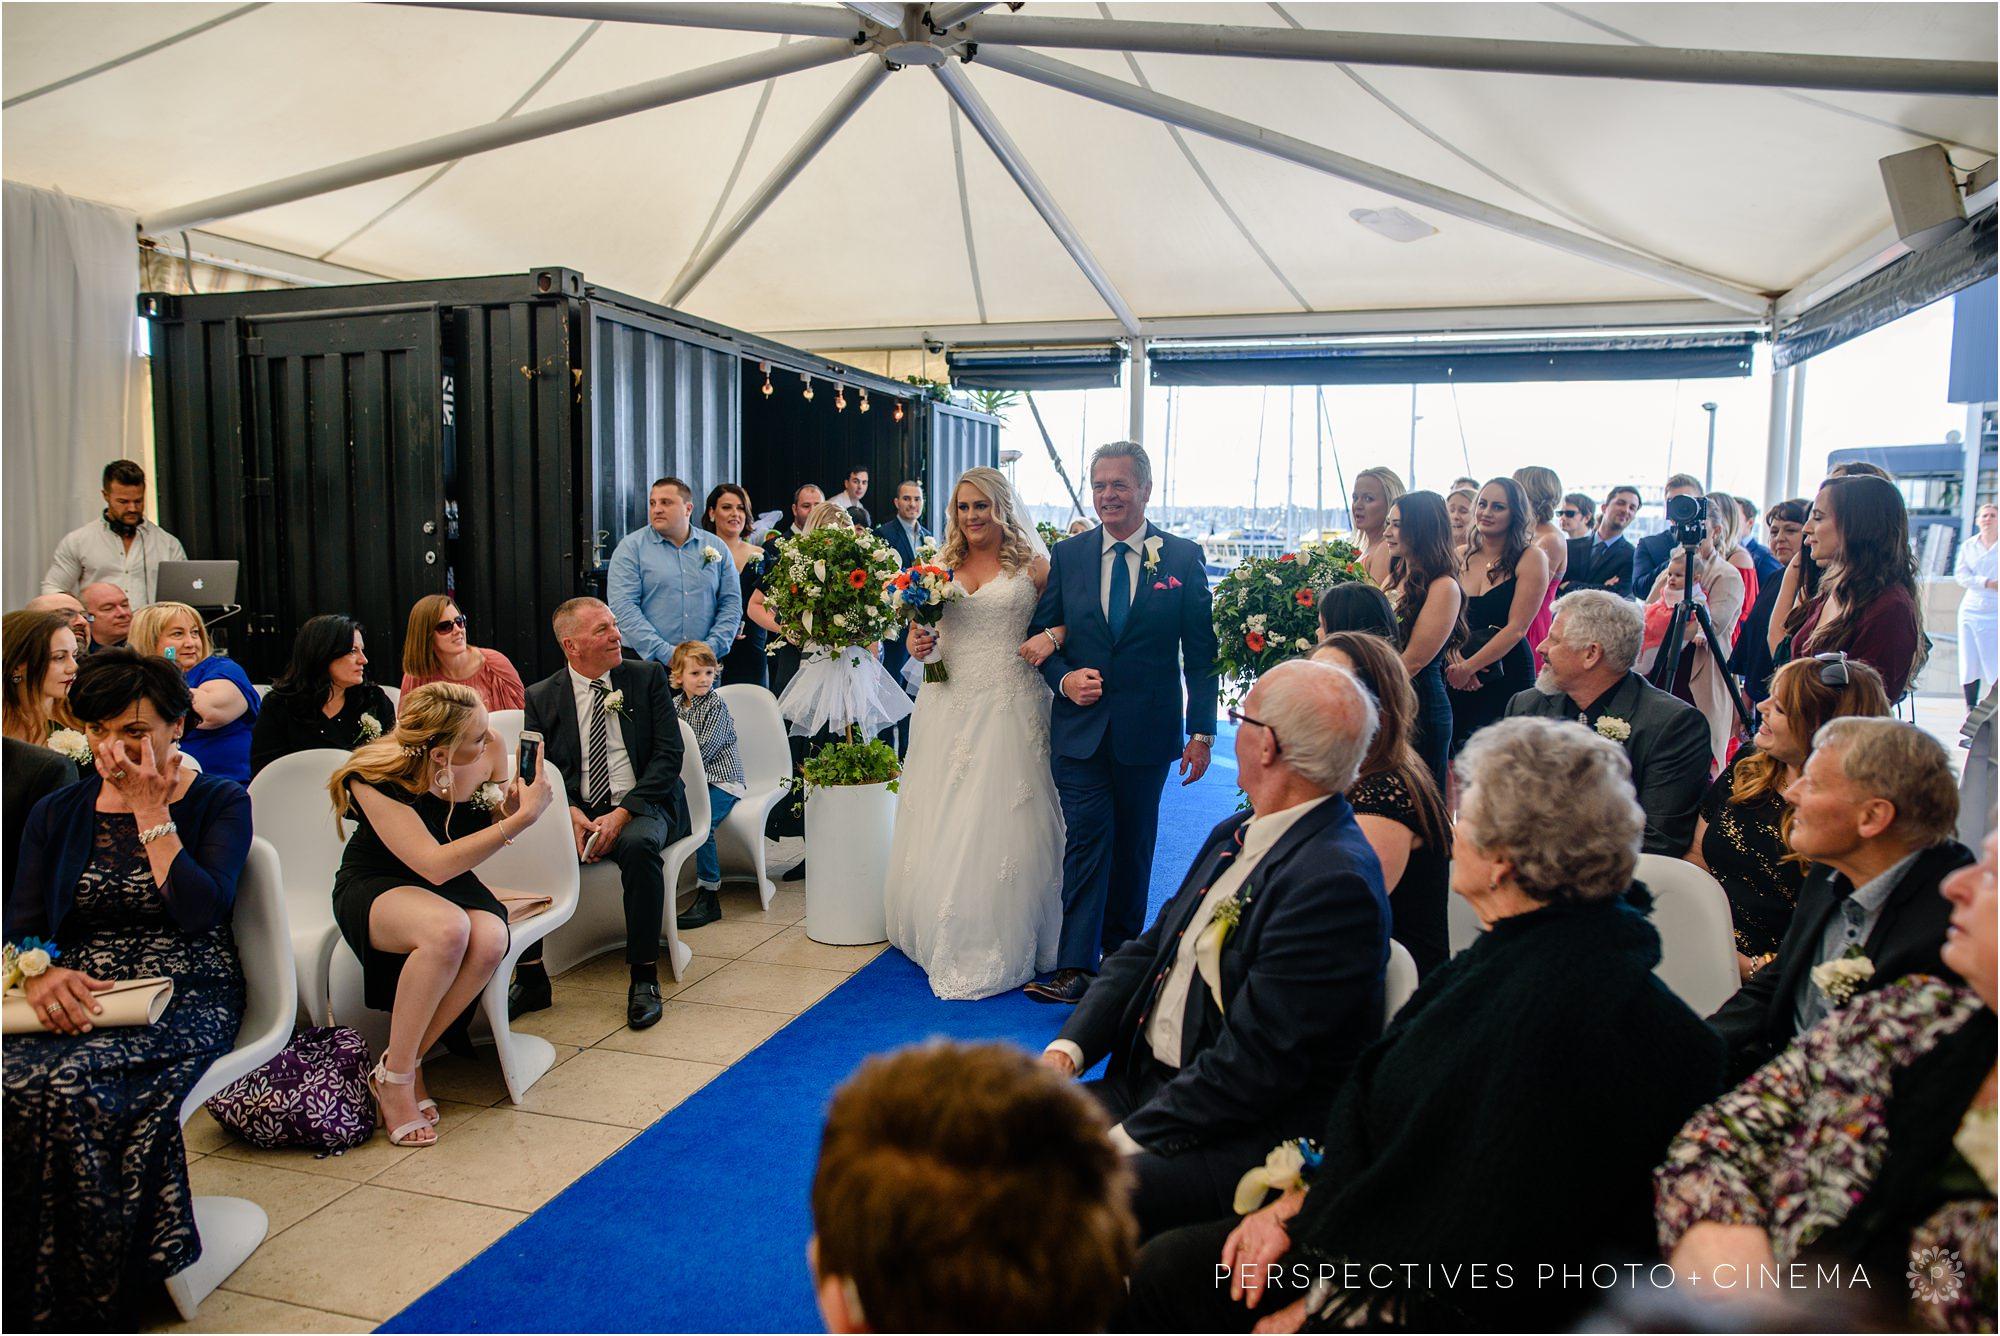 mantells wedding photos